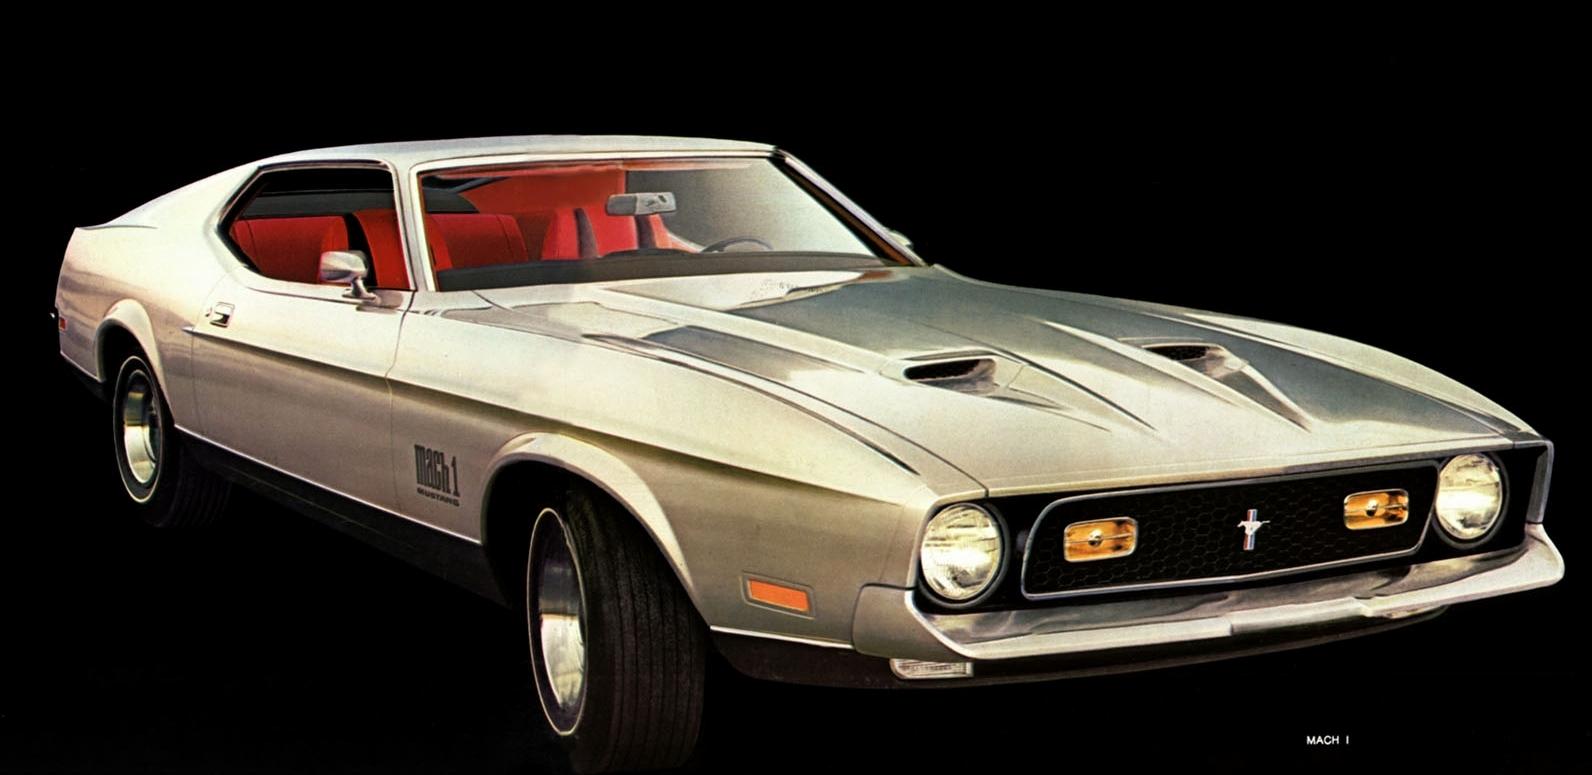 1971 Mustang Mach 1 sportsroof